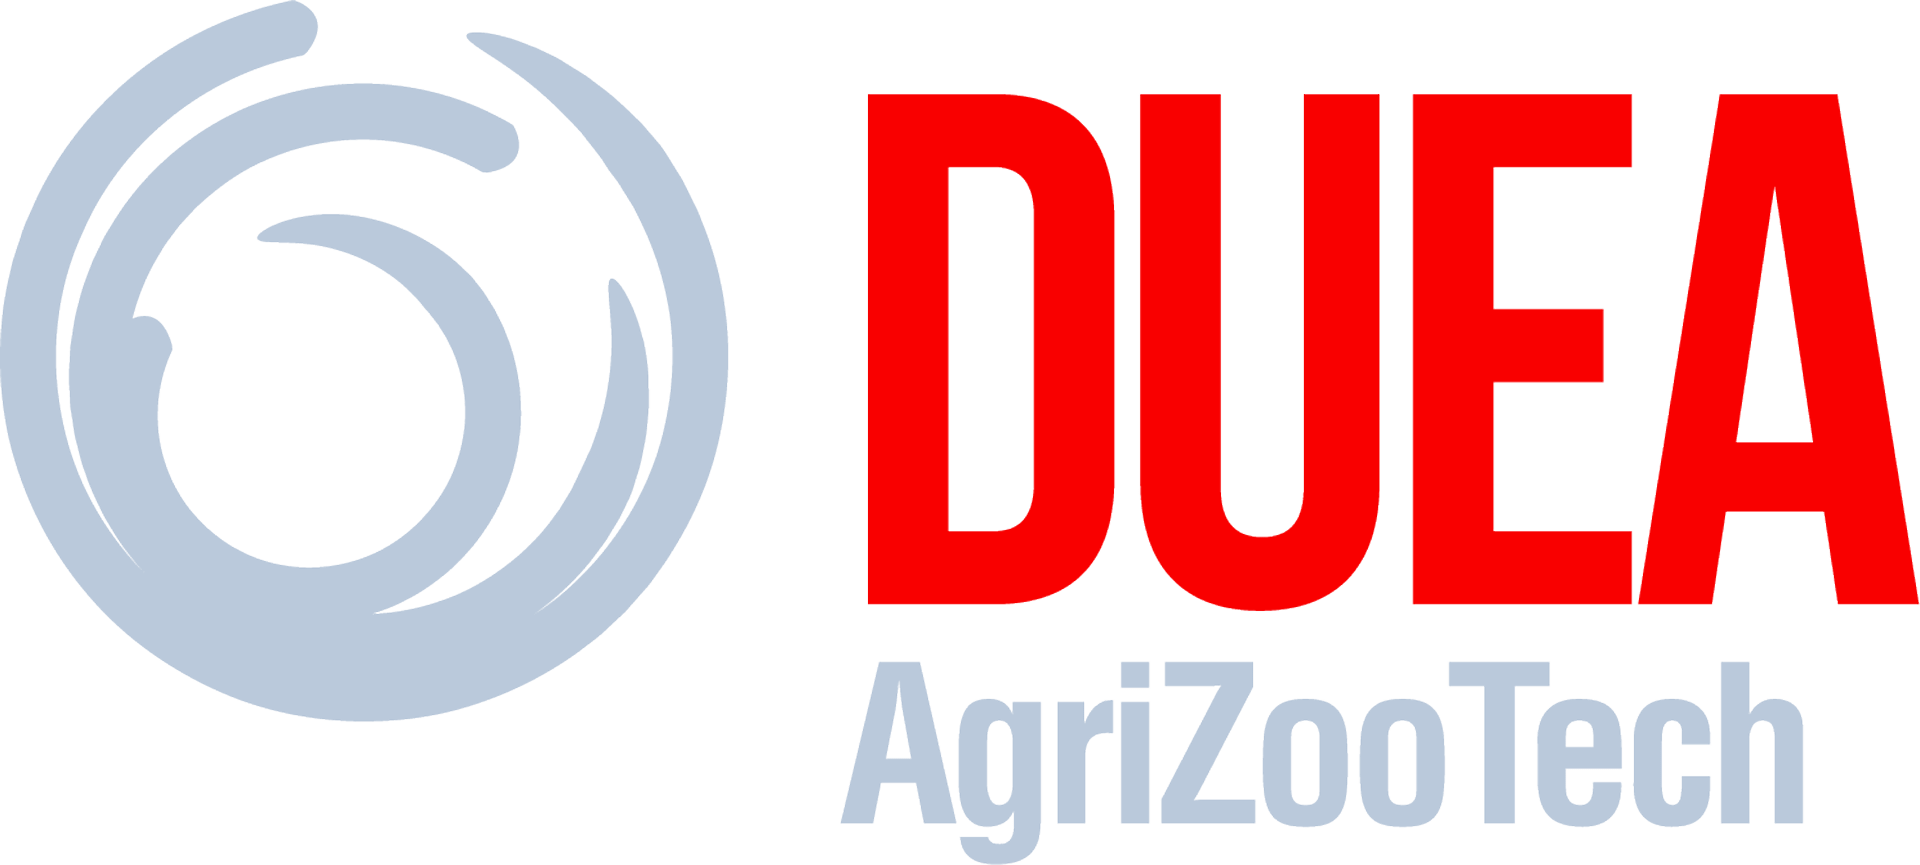 agrizootech